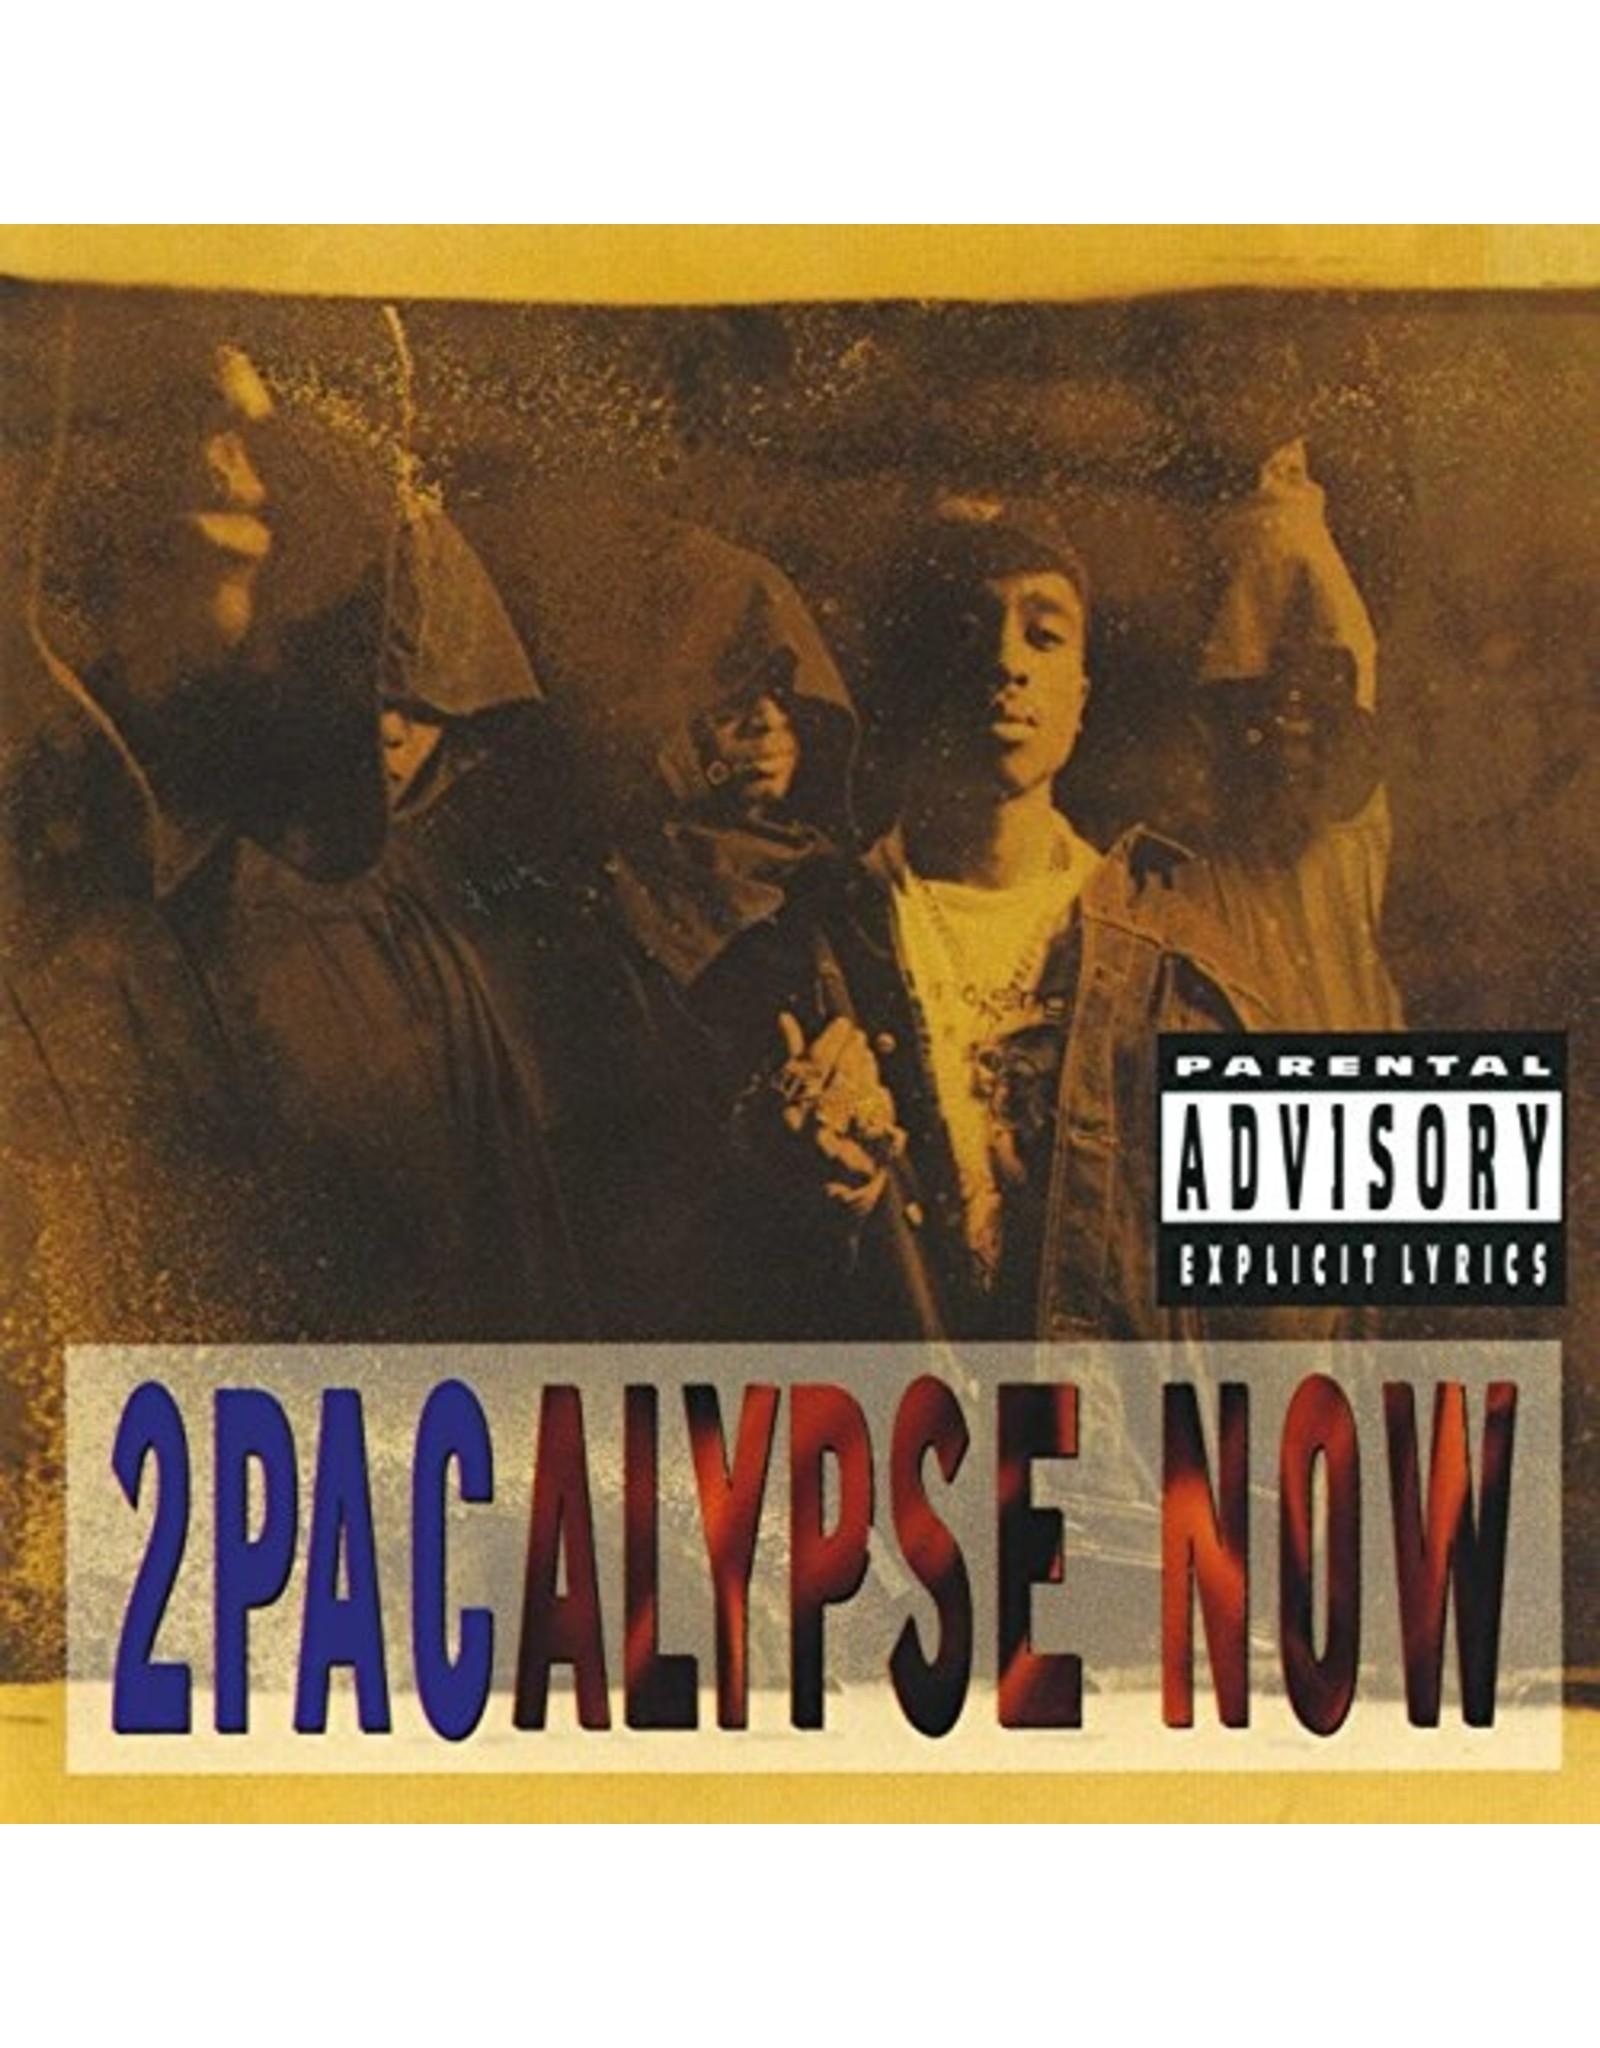 New Vinyl 2Pac - 2pacalypse Now 2LP